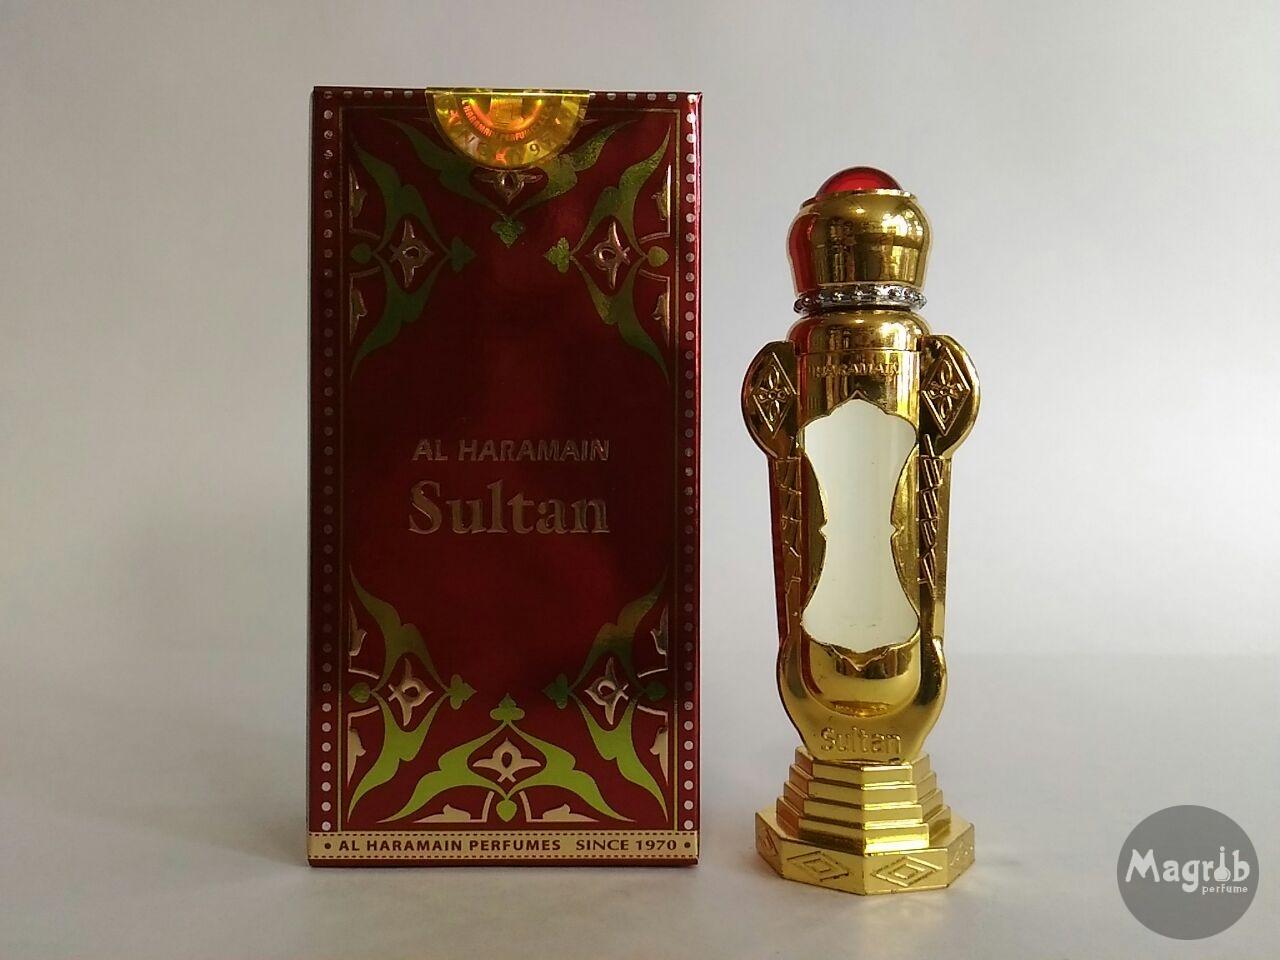 Al-Haramain Sultan 12ml - унисекс, масляные духи